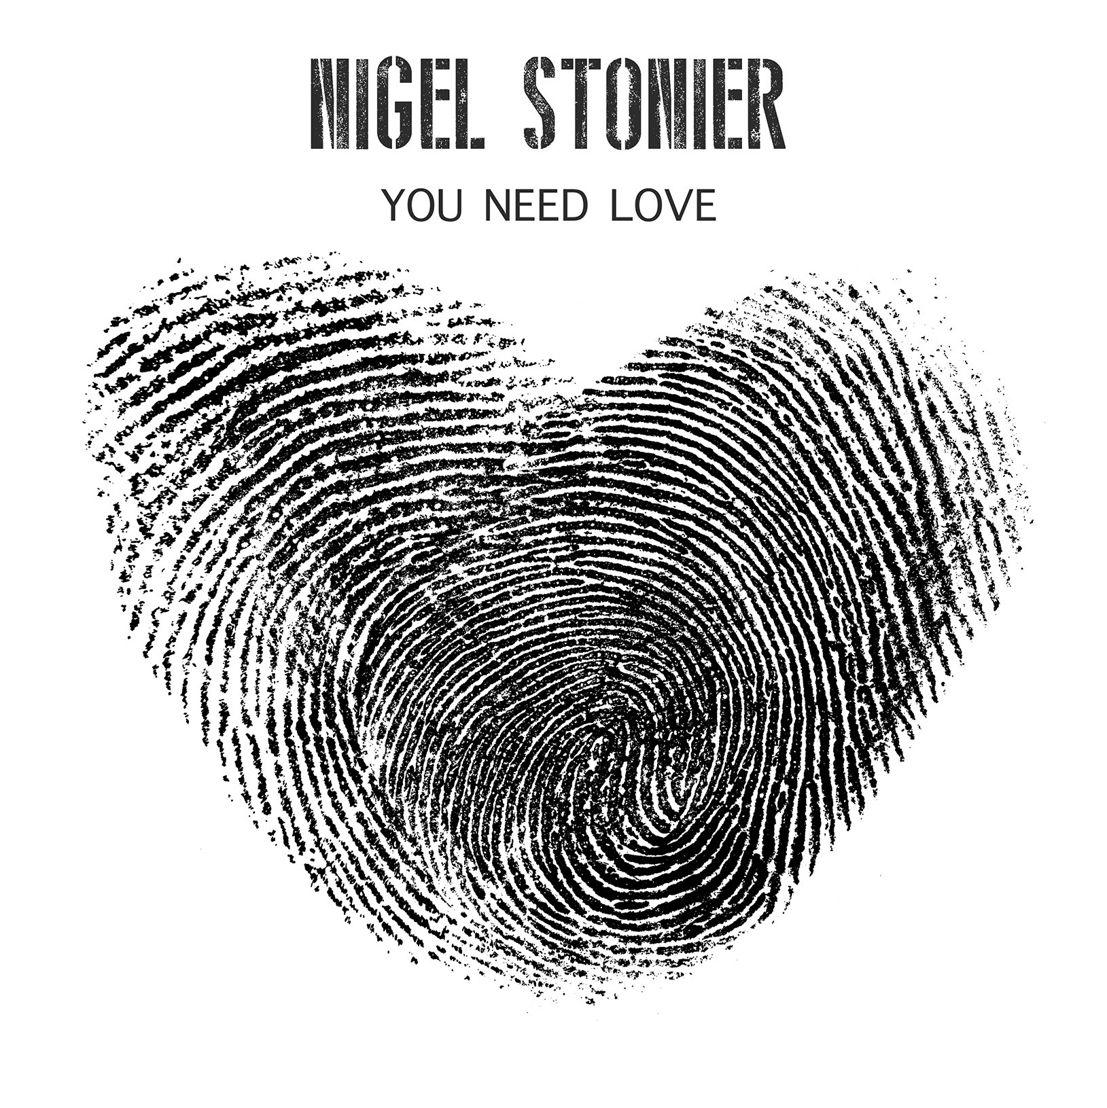 Nigel Stonier single hi-res